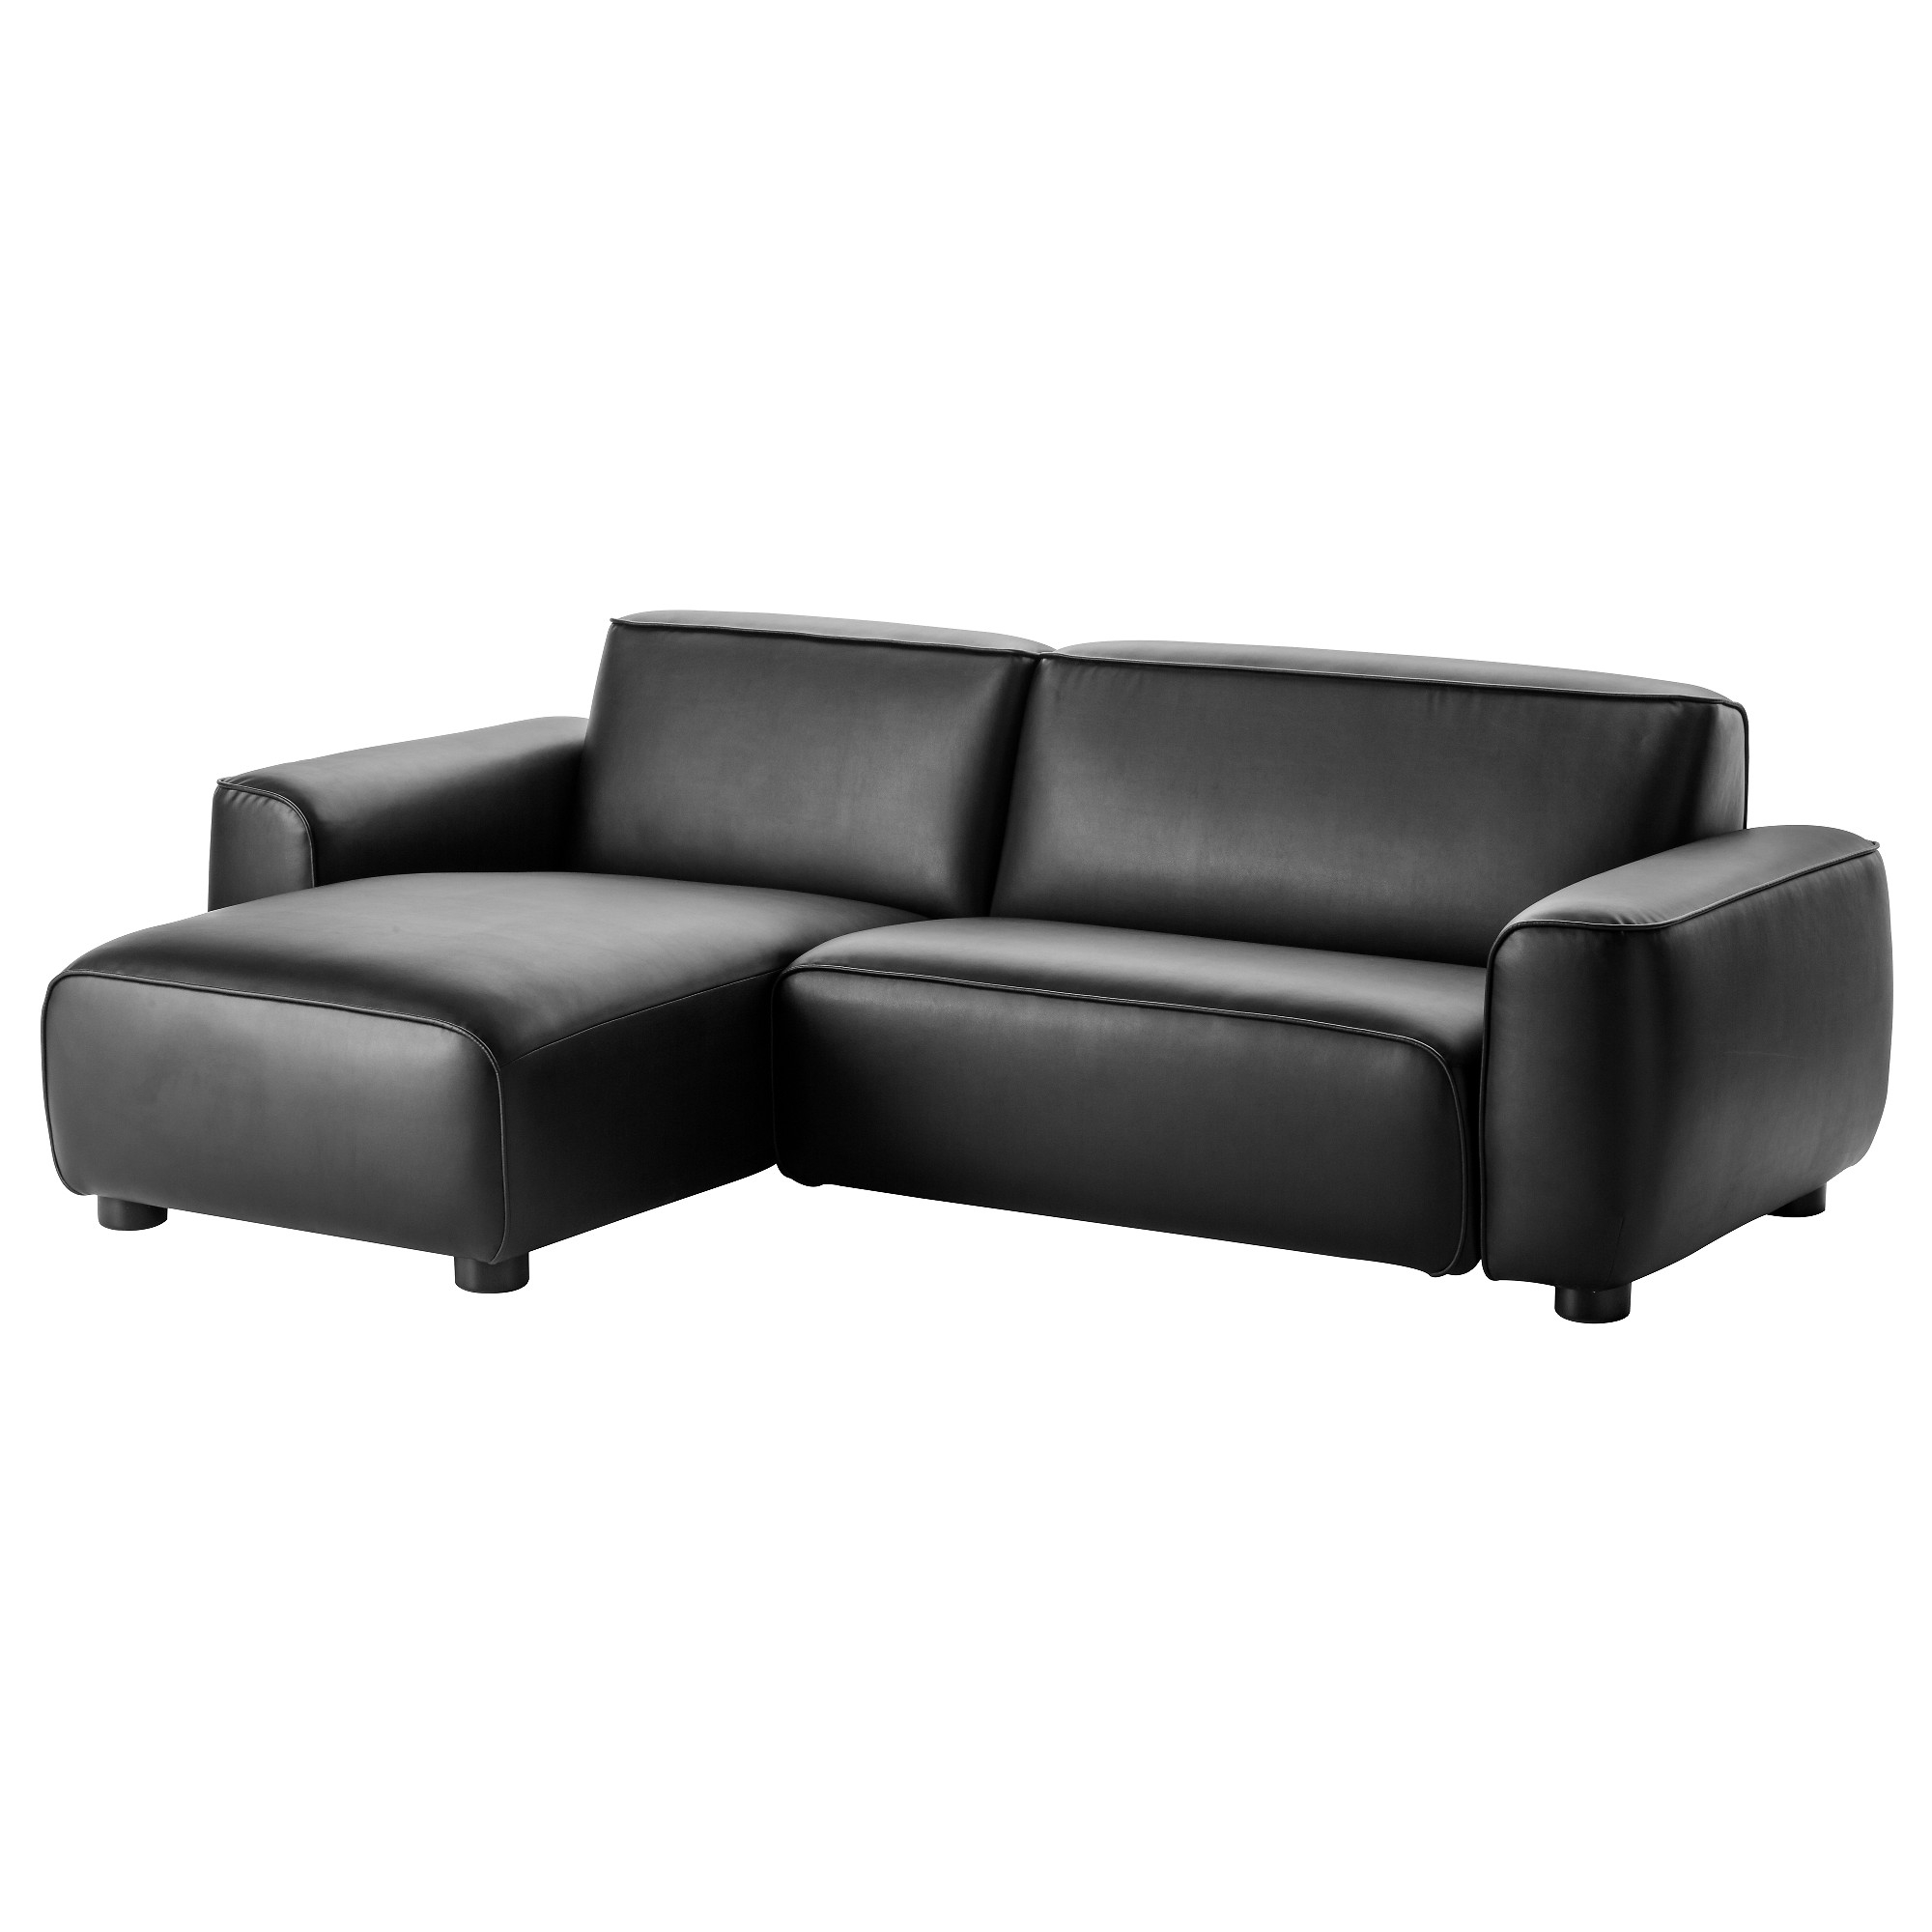 Dagarn sof 2 plazas chaise longue for Sofa 2 plazas mas chaise longue